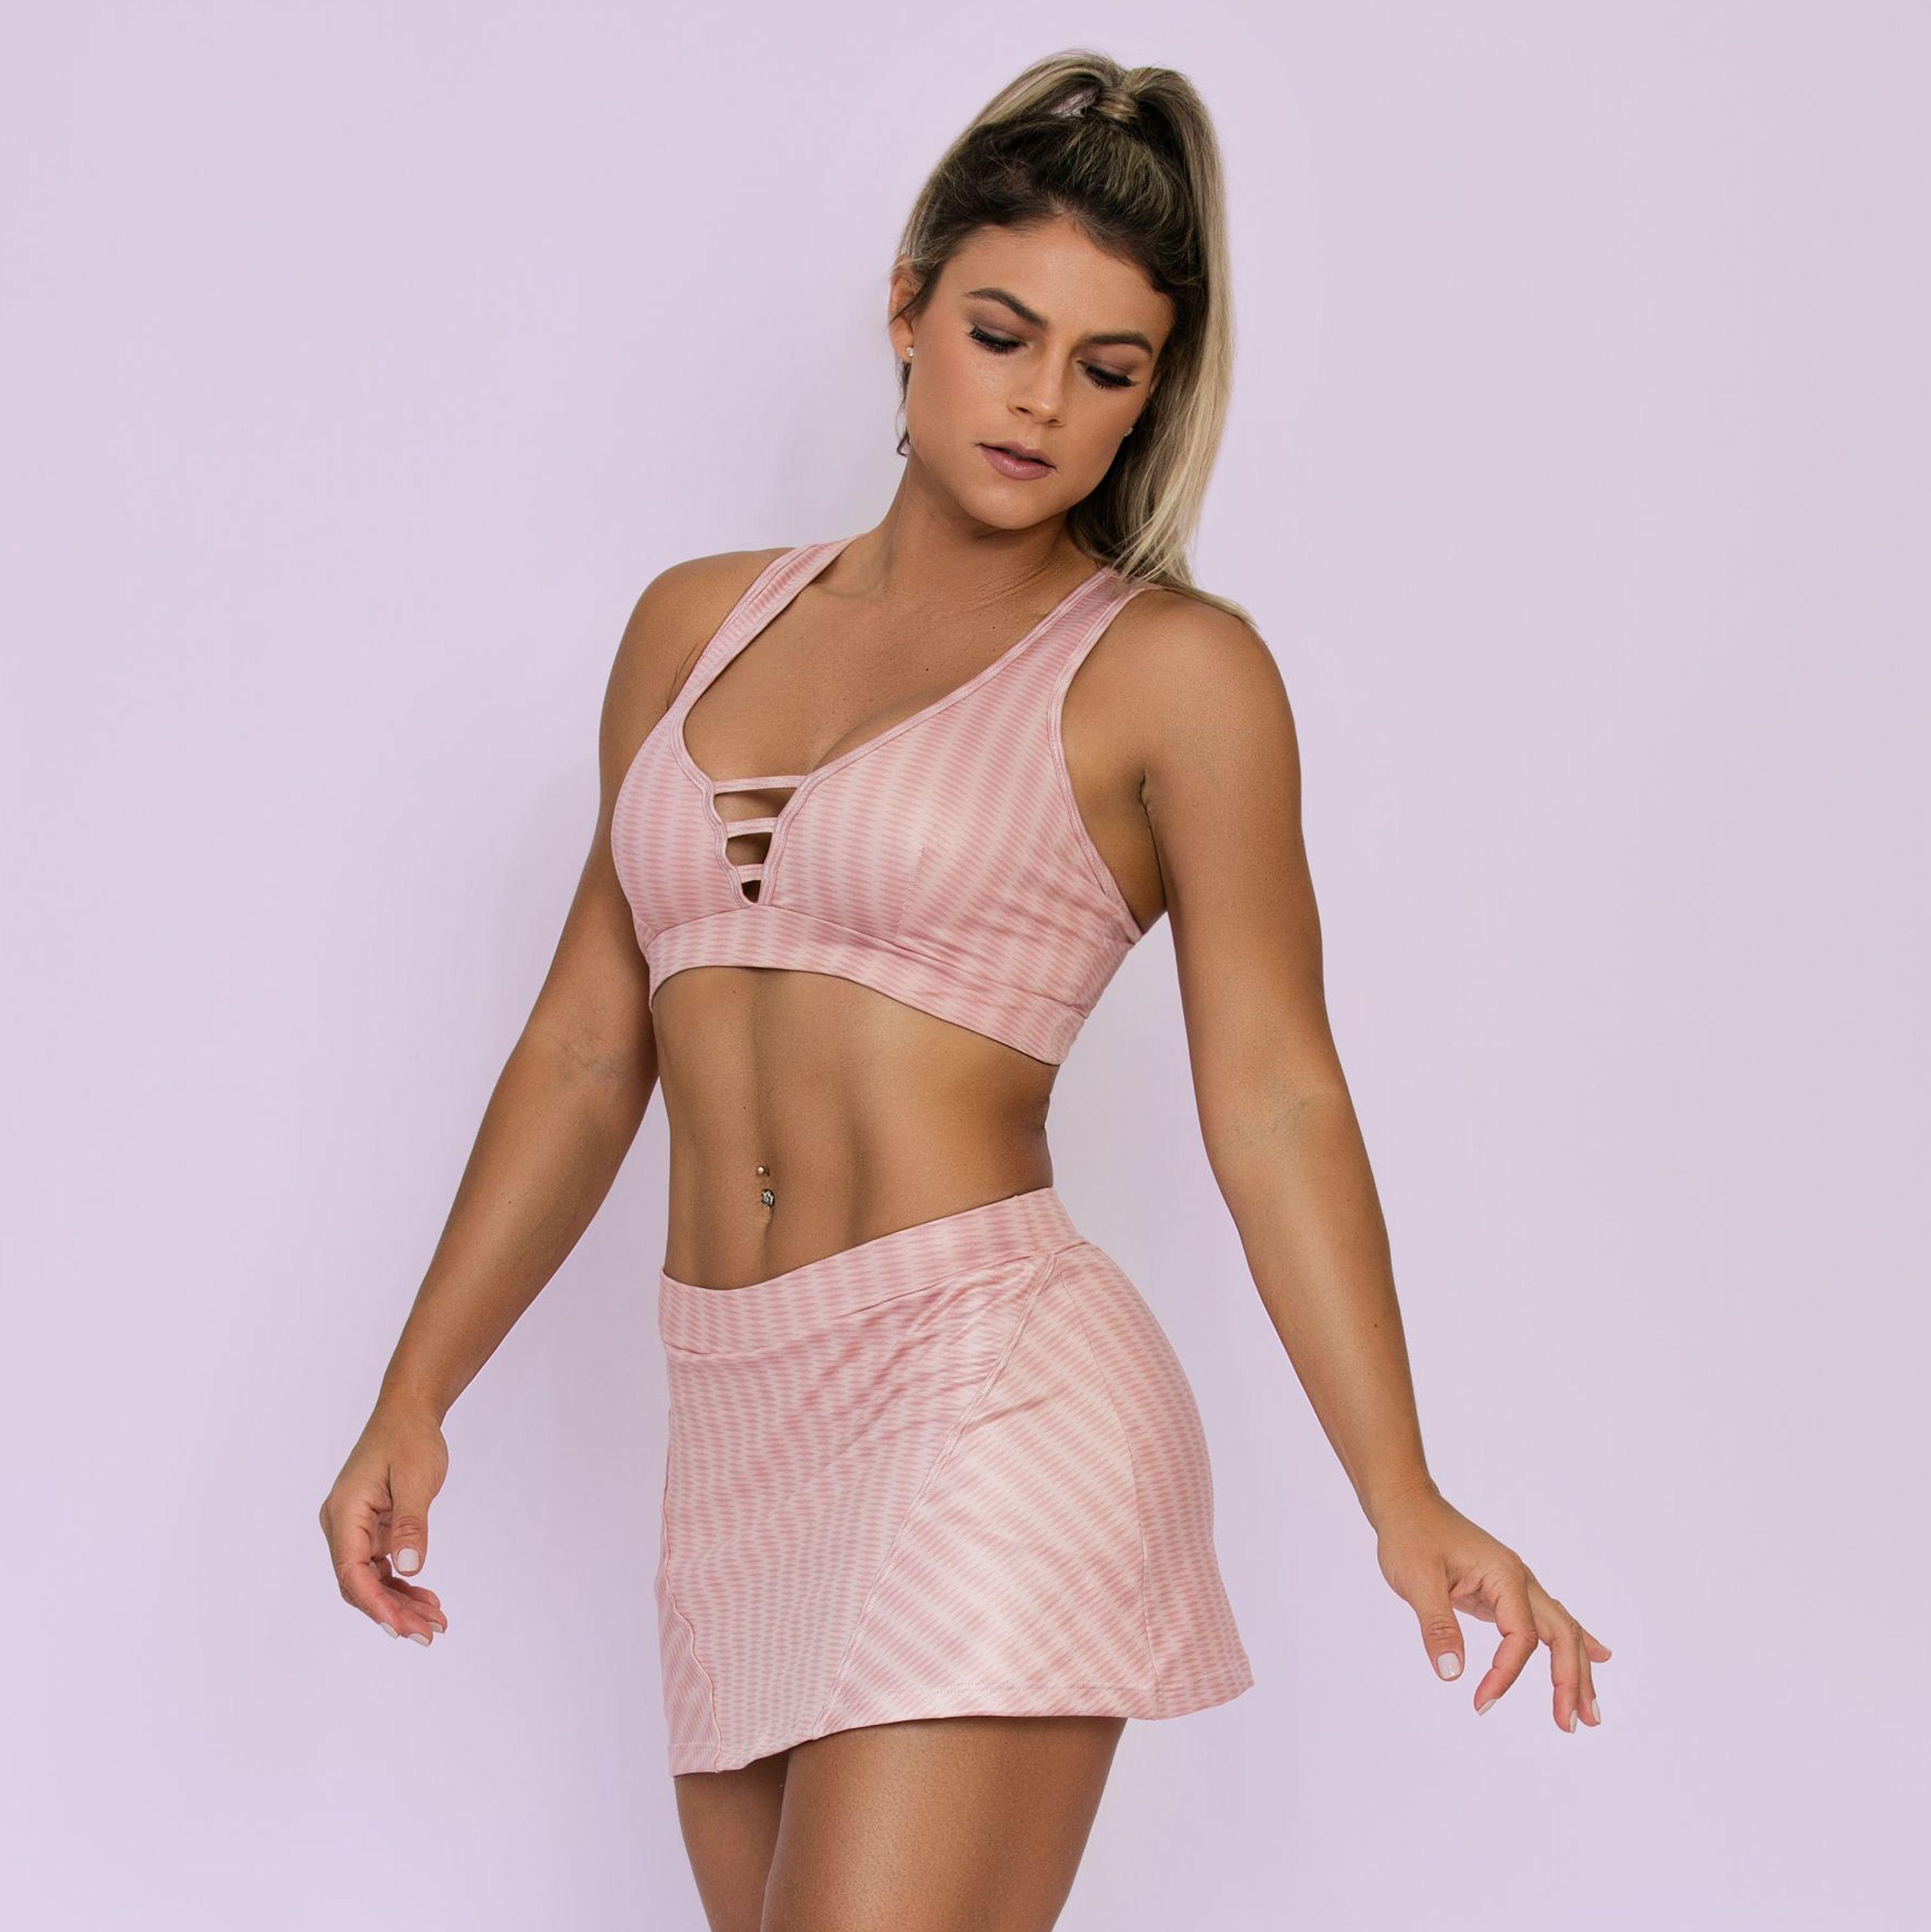 2432ffb6cf23 ... Moda Fitness · Conjunto; Conjunto Blush em Cirrê Estampado. 88%  poliéster. 12%elastano. 1